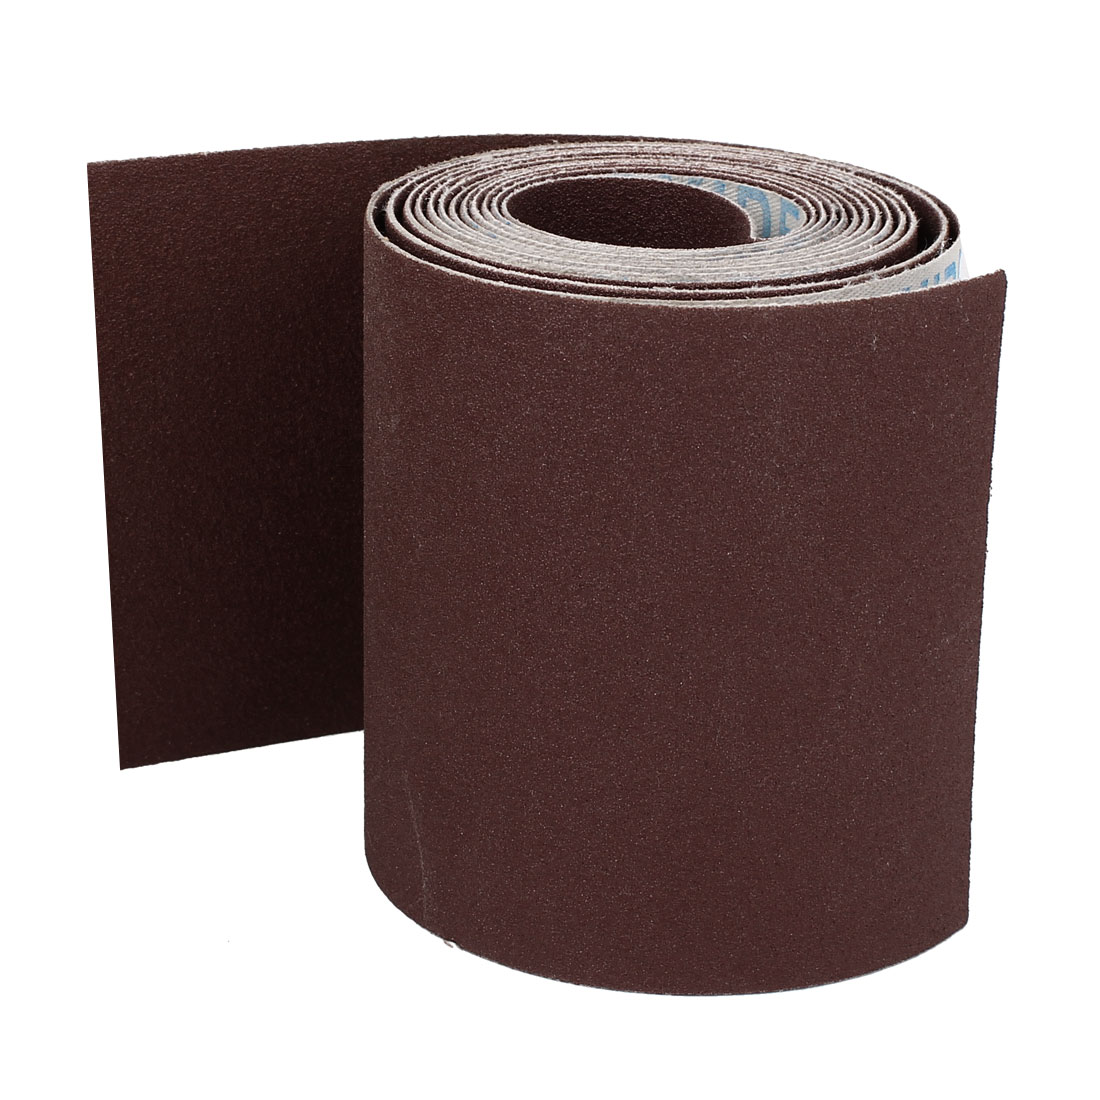 5M Long 100mm Width 180 Grit Abrasive Sanding Sand Paper Sandpaper